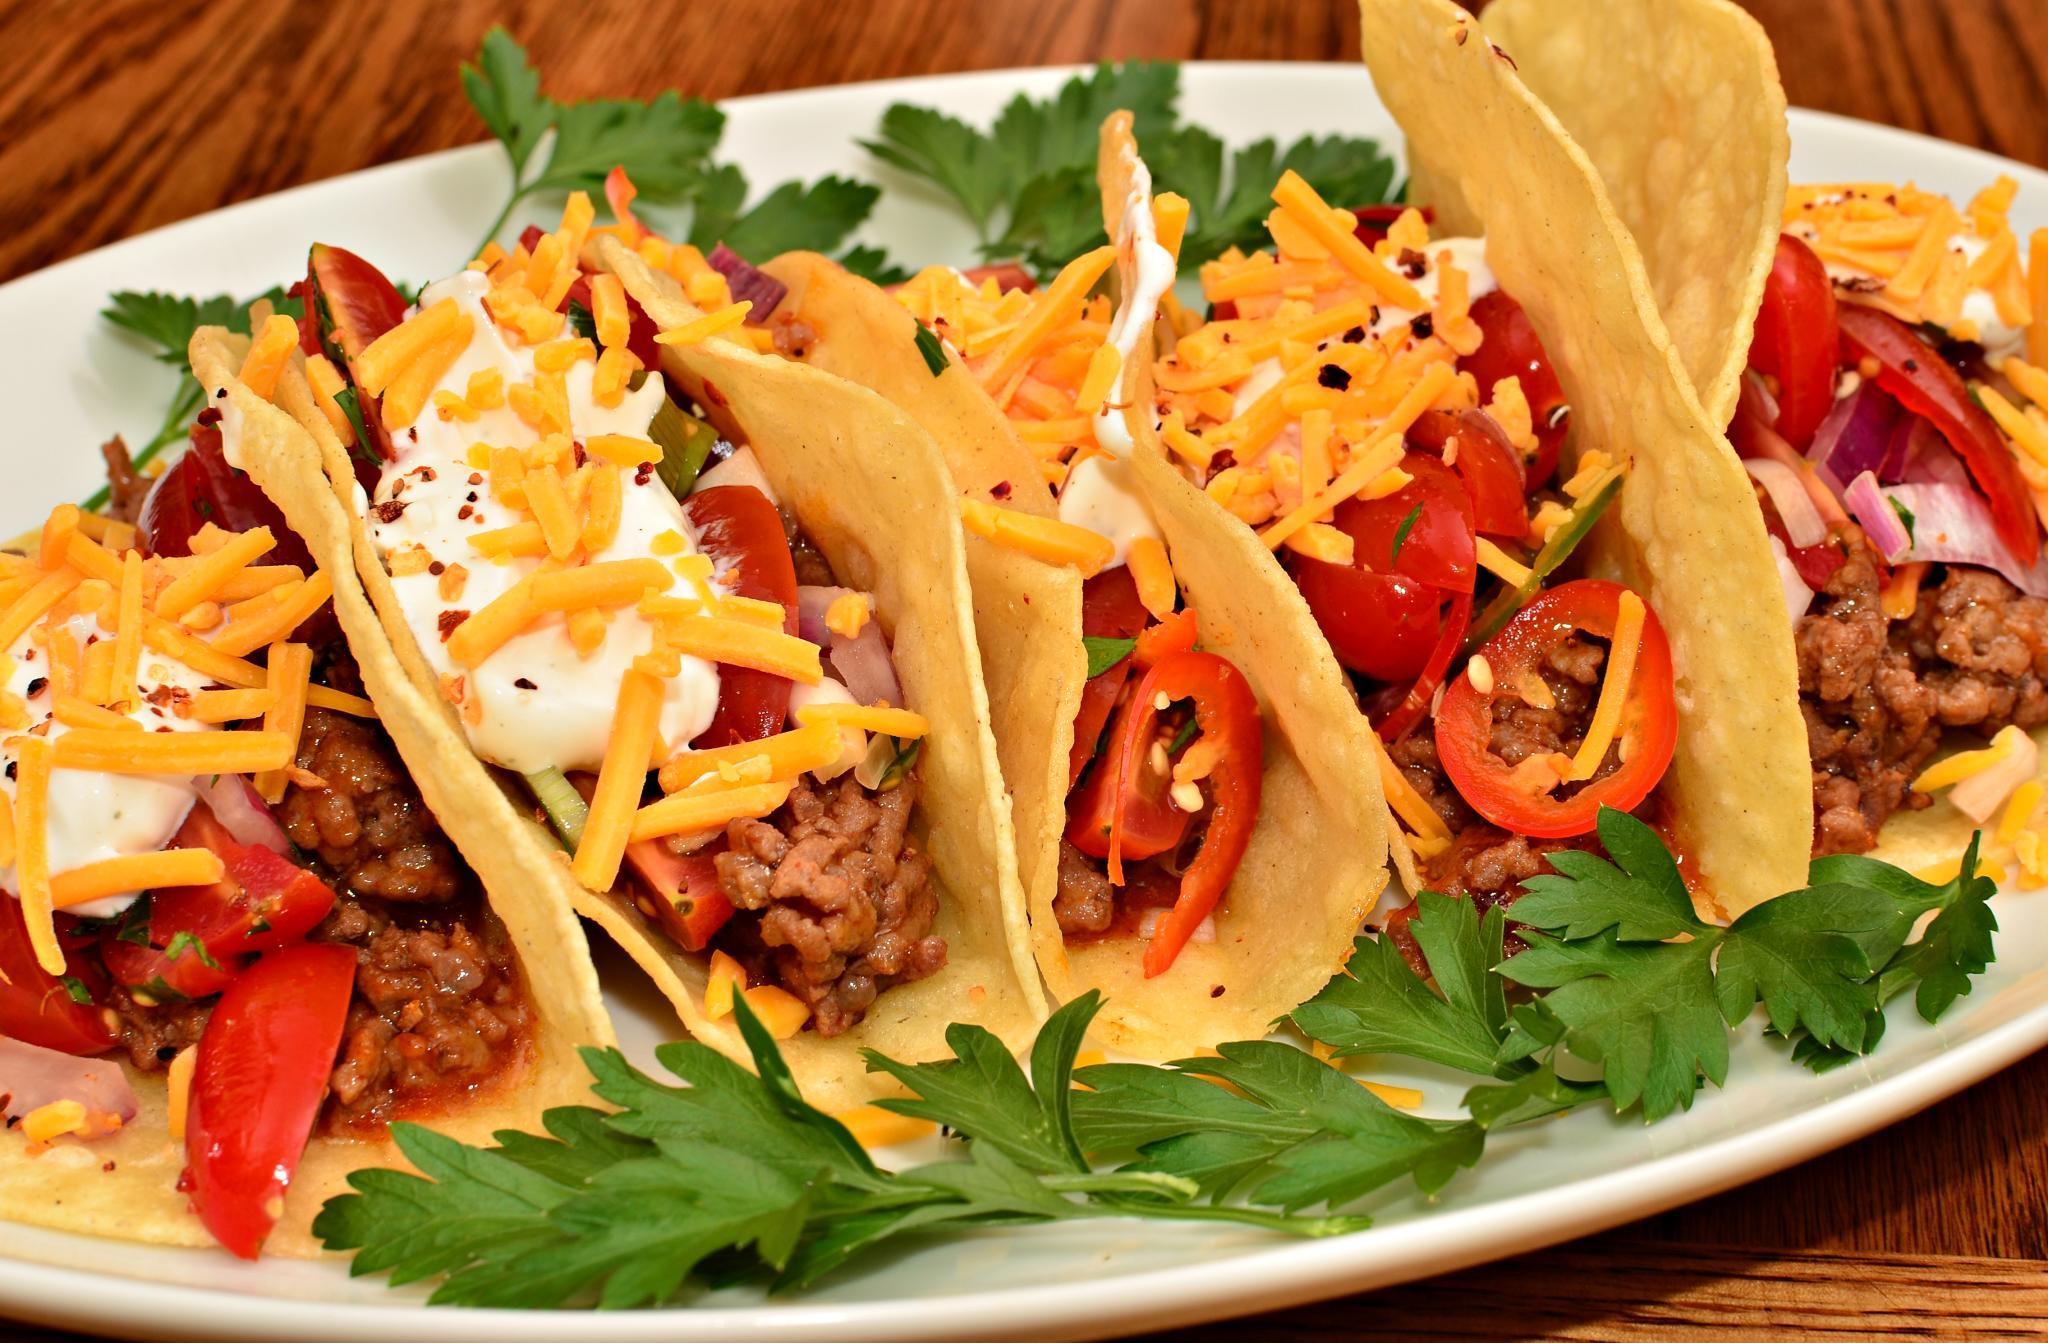 File mmm wikimedia commons - Tacos mexicanos de pollo ...